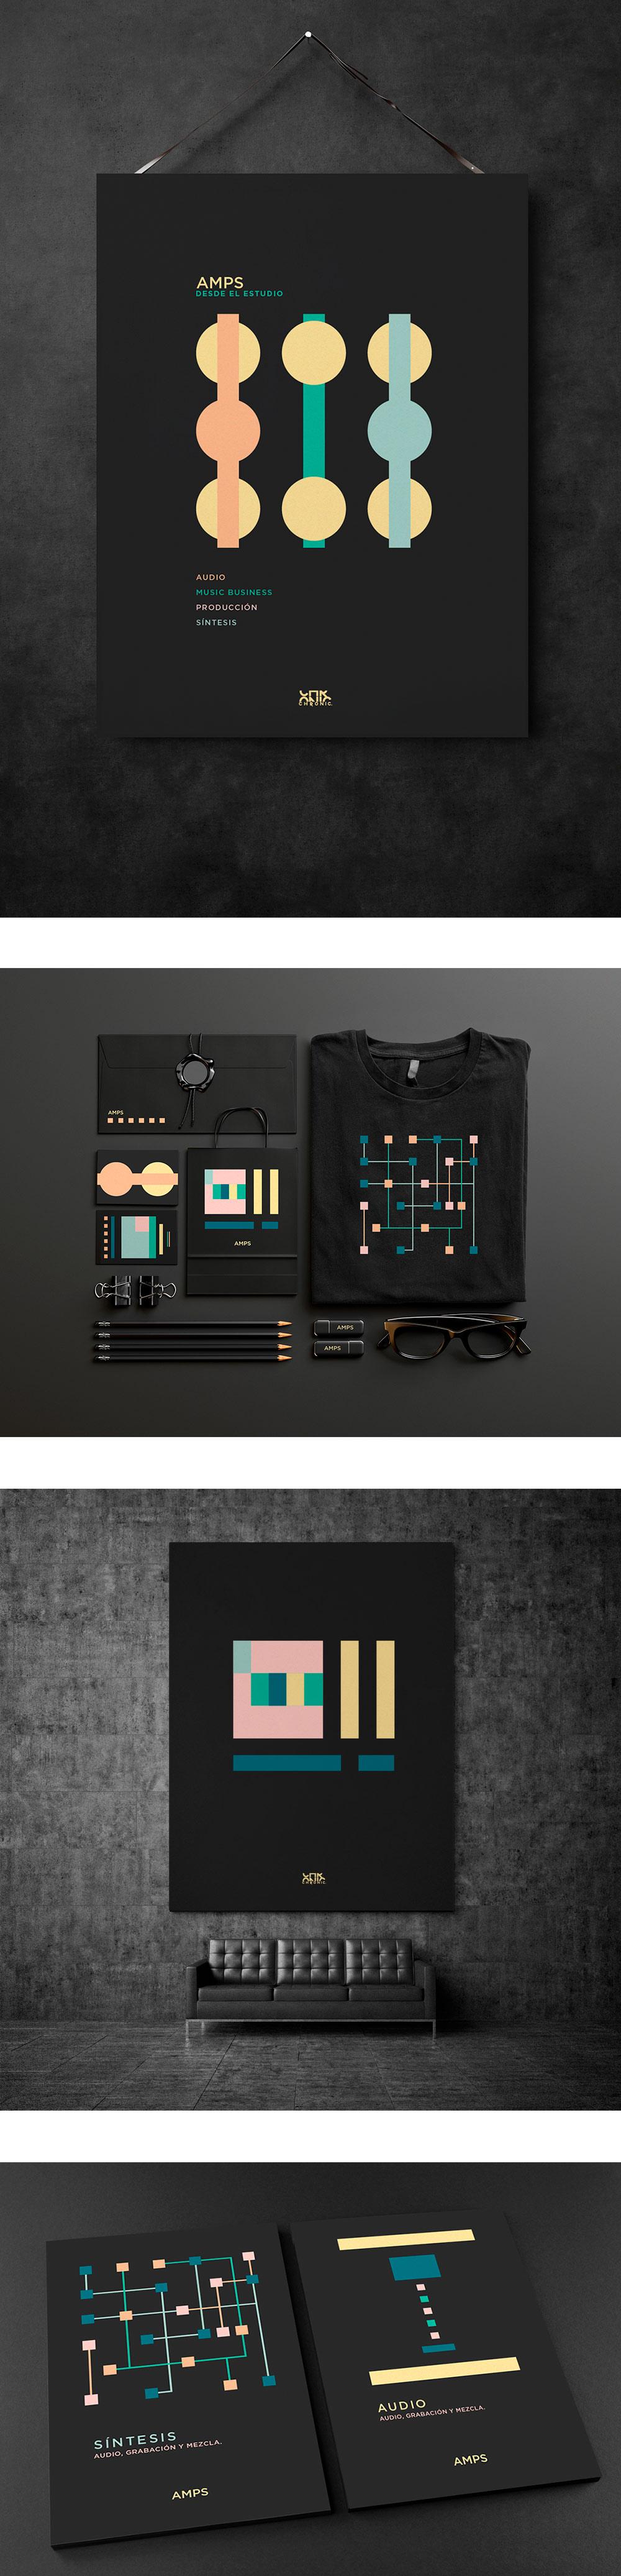 Branding Inspiration - The Fresh, Playful & Unique Work of SMF Studio